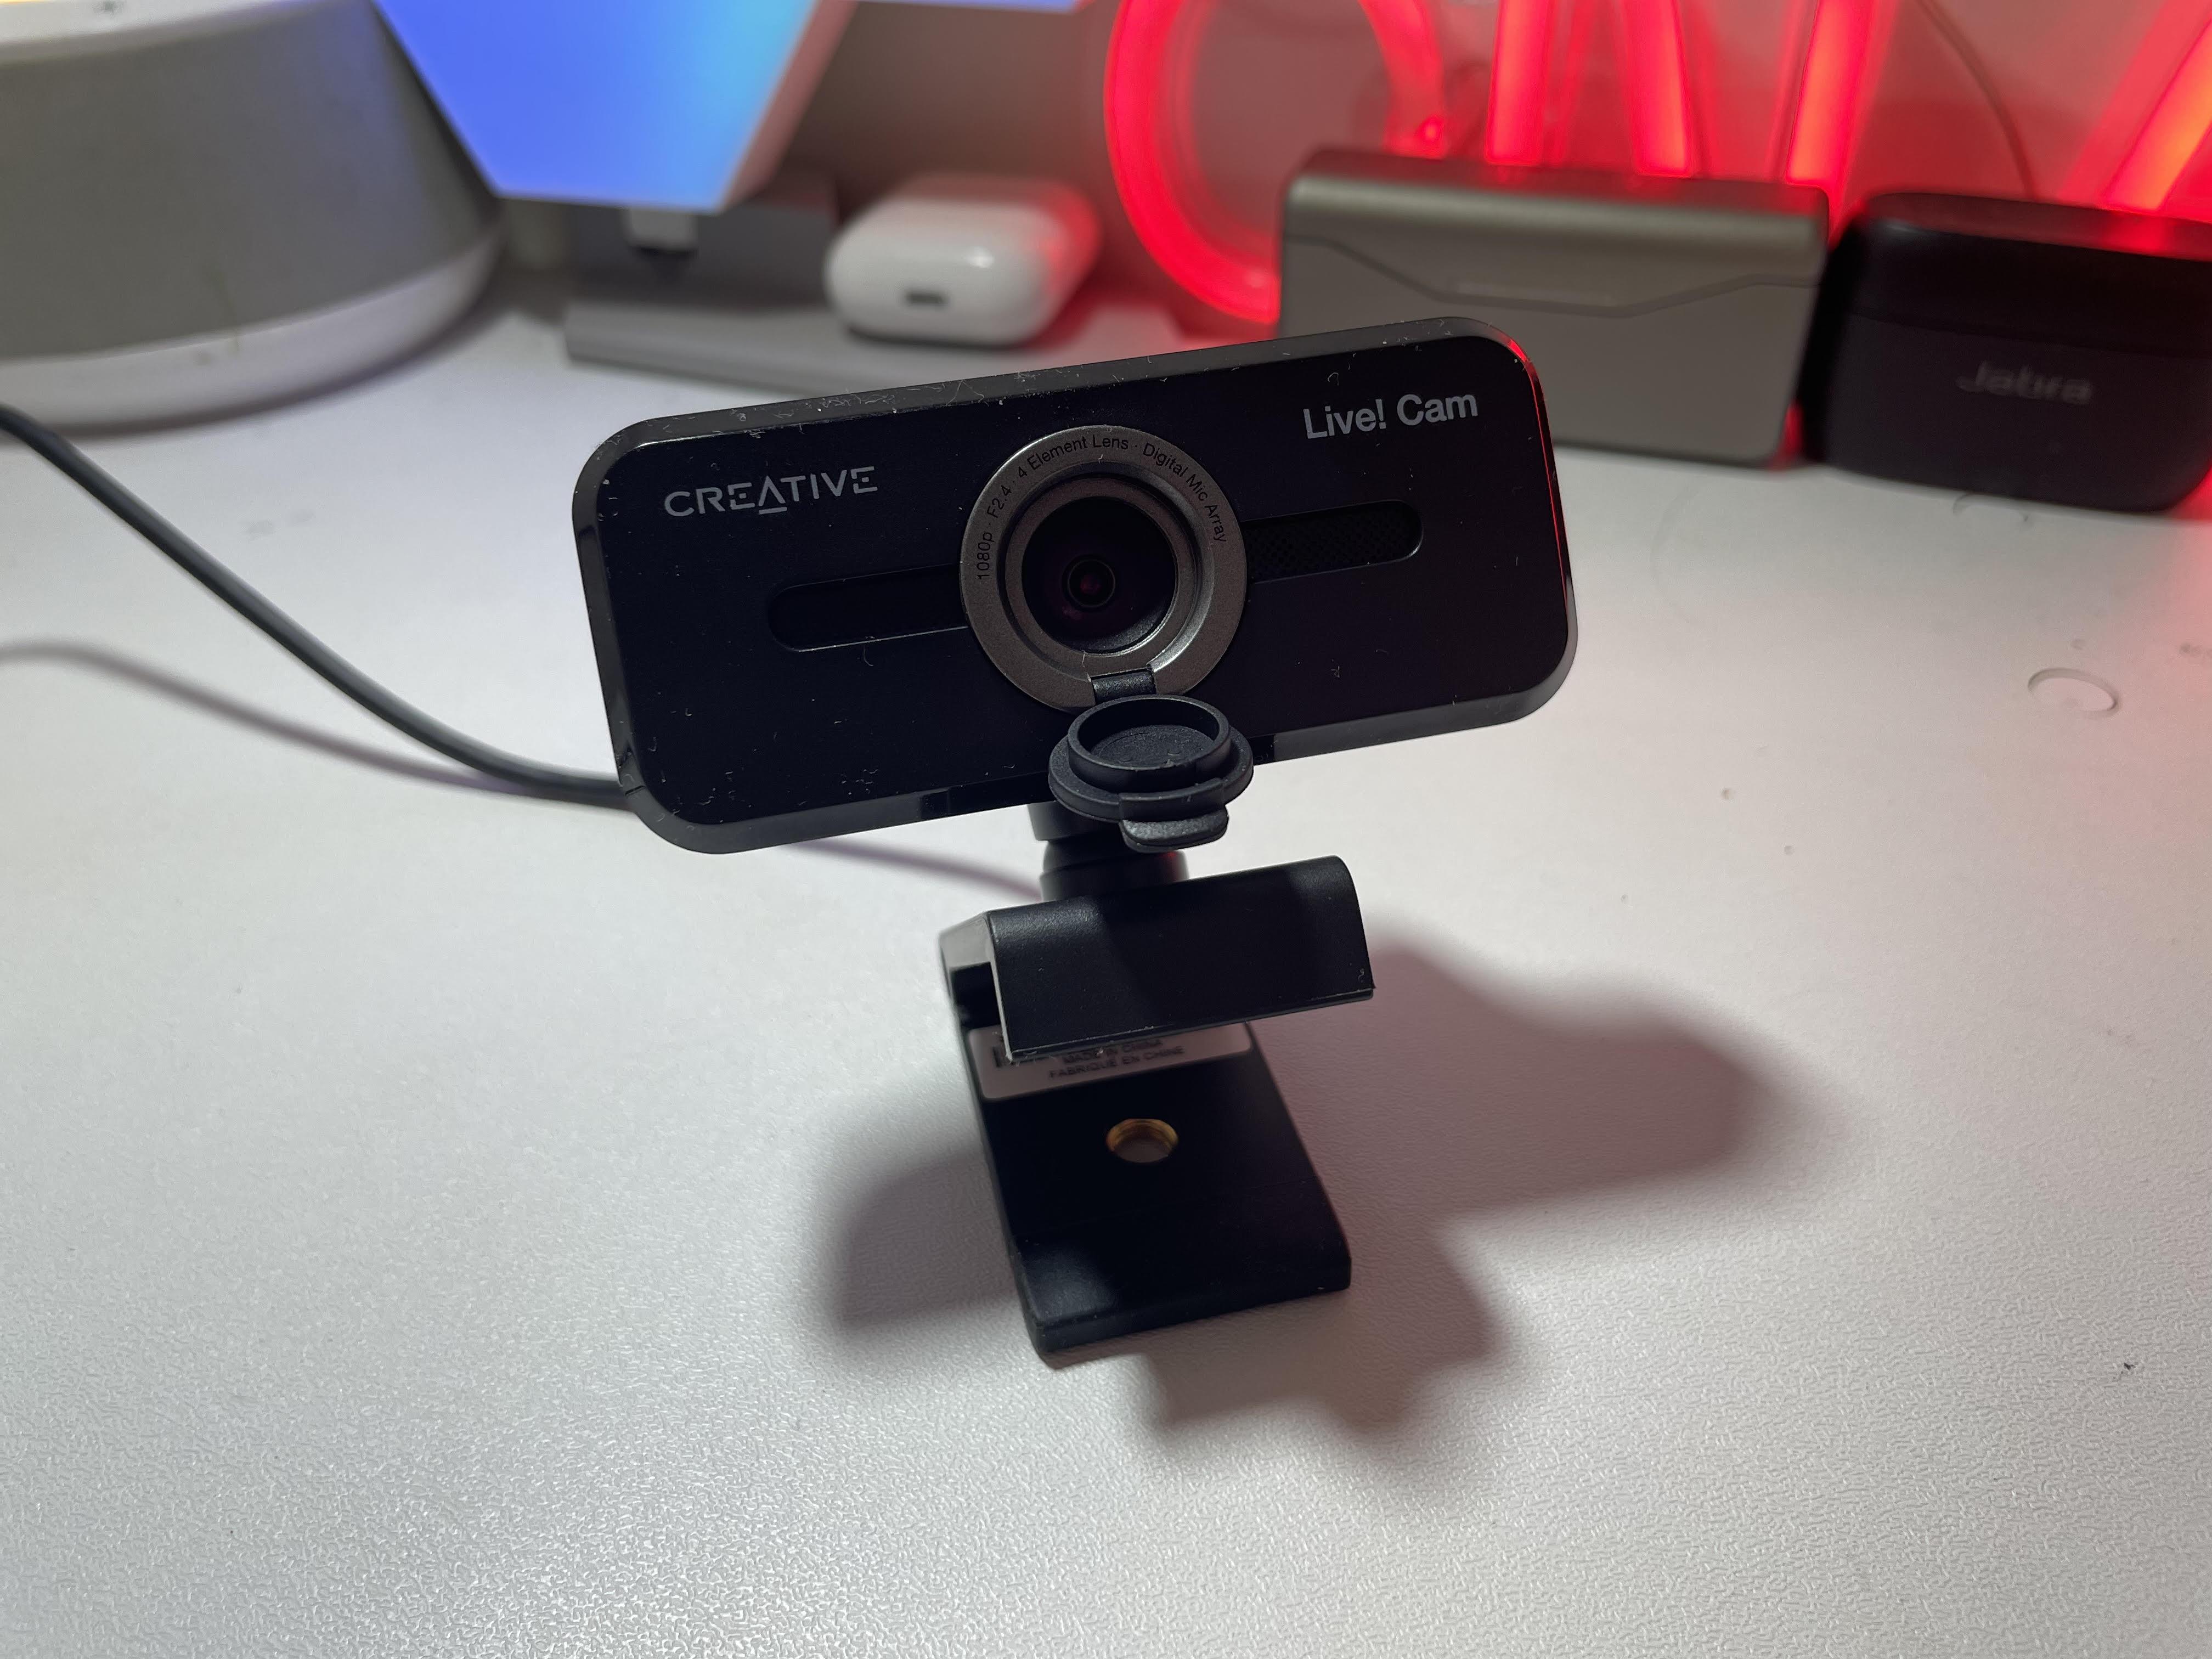 creative live cam sync 1080p v2 techbuzzireland